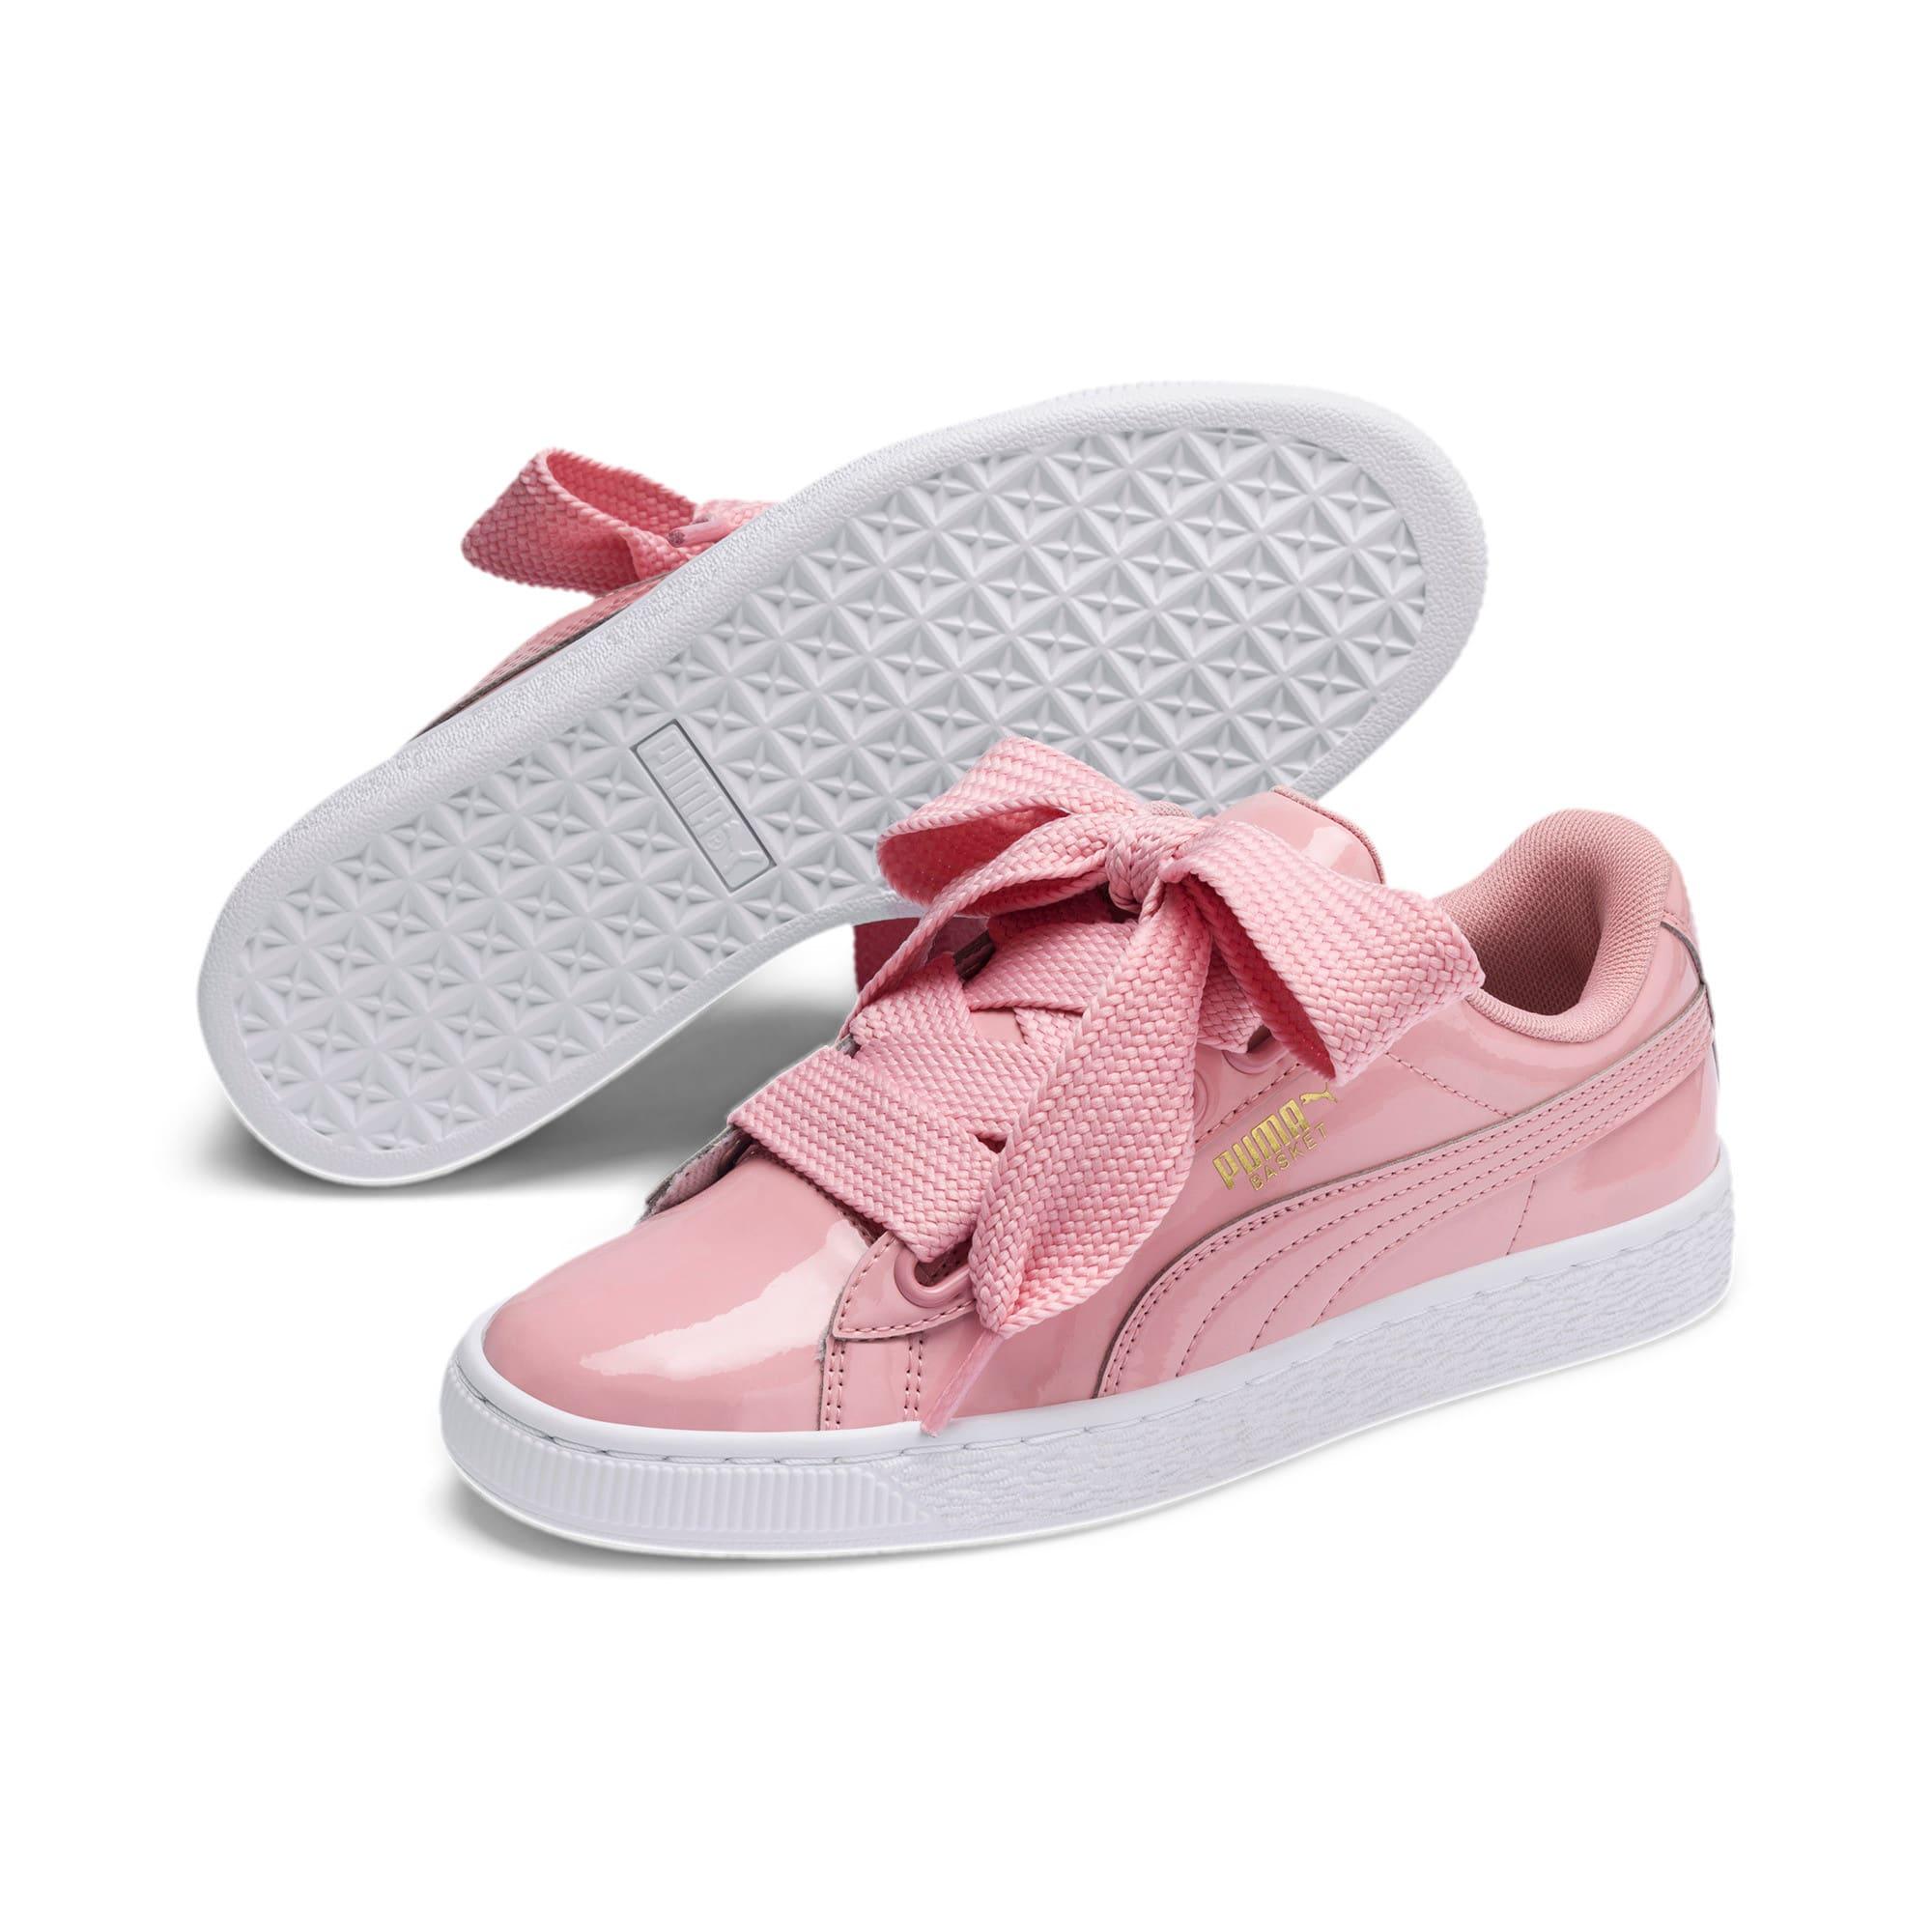 Thumbnail 3 of Basket Heart Patent Women's Sneakers, Bridal Rose-Puma Team Gold, medium